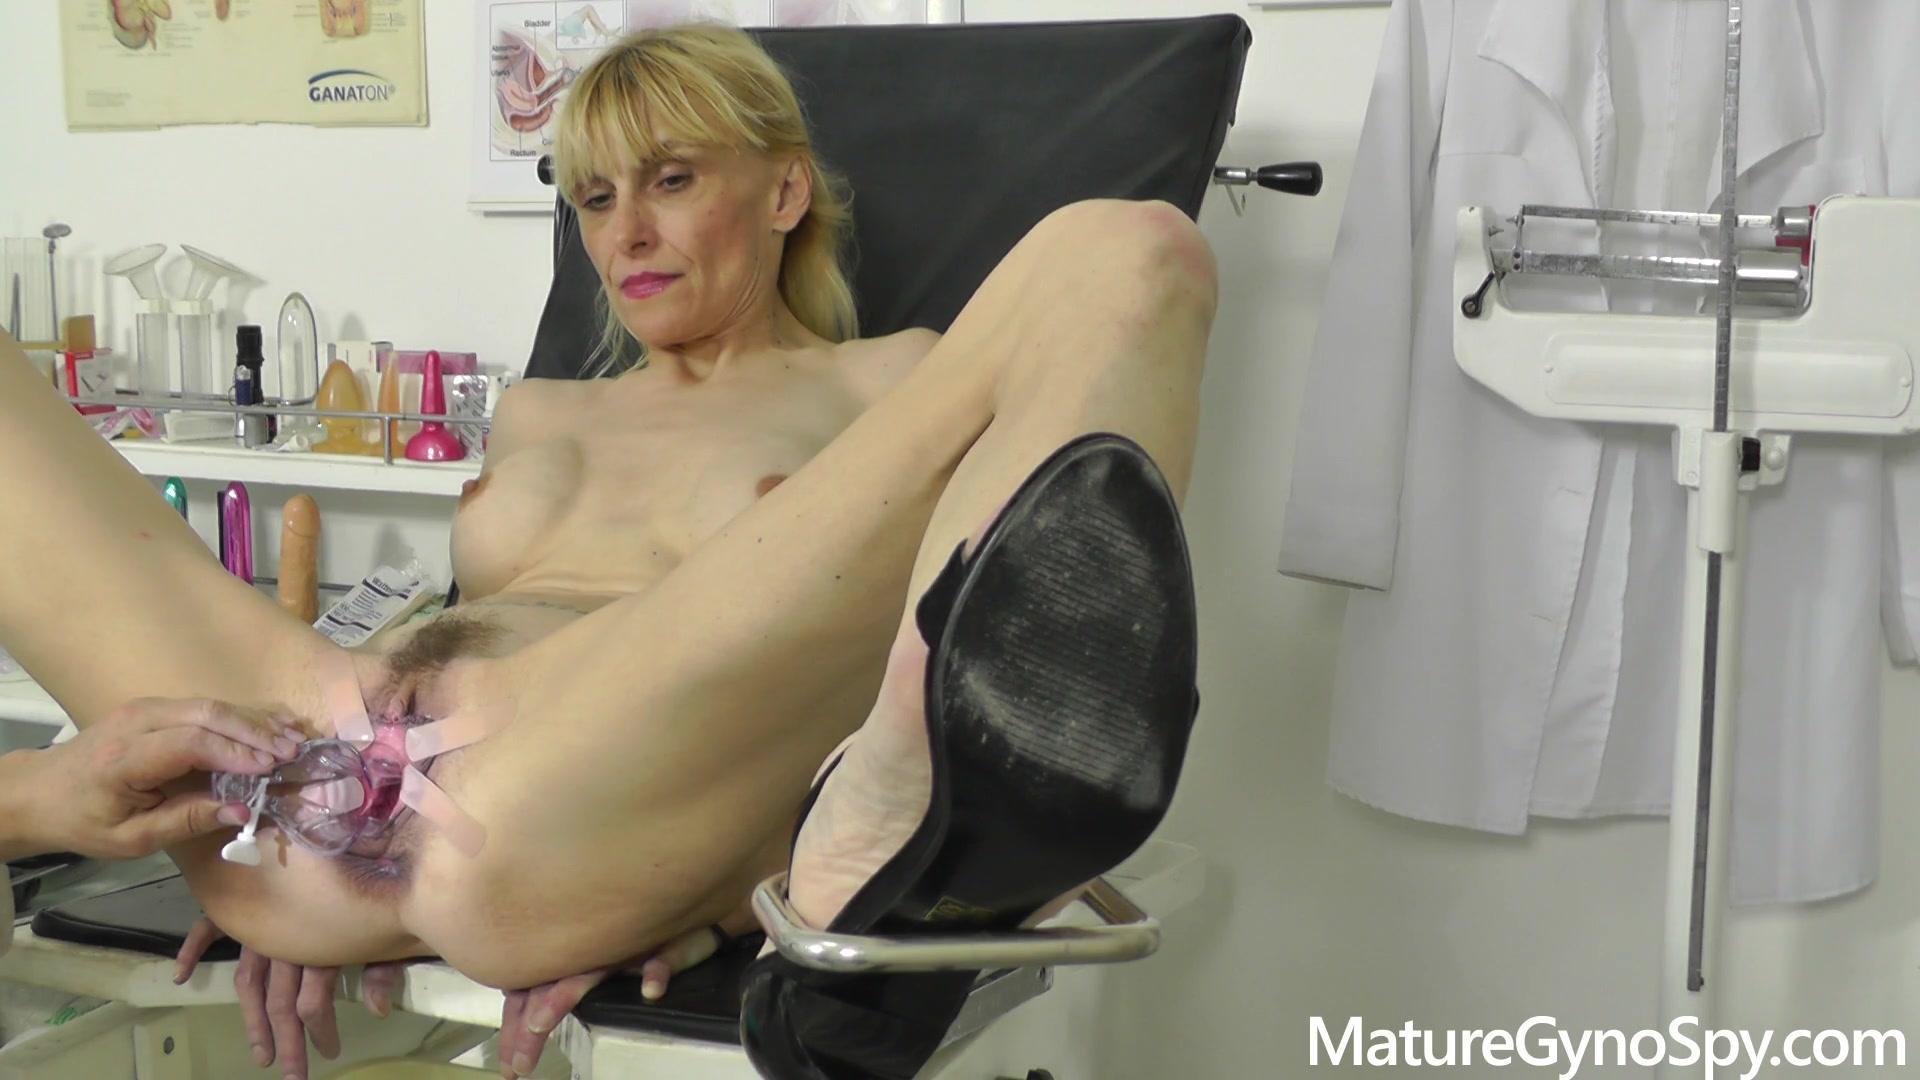 Mature Gyno Spy – Valeria Blond